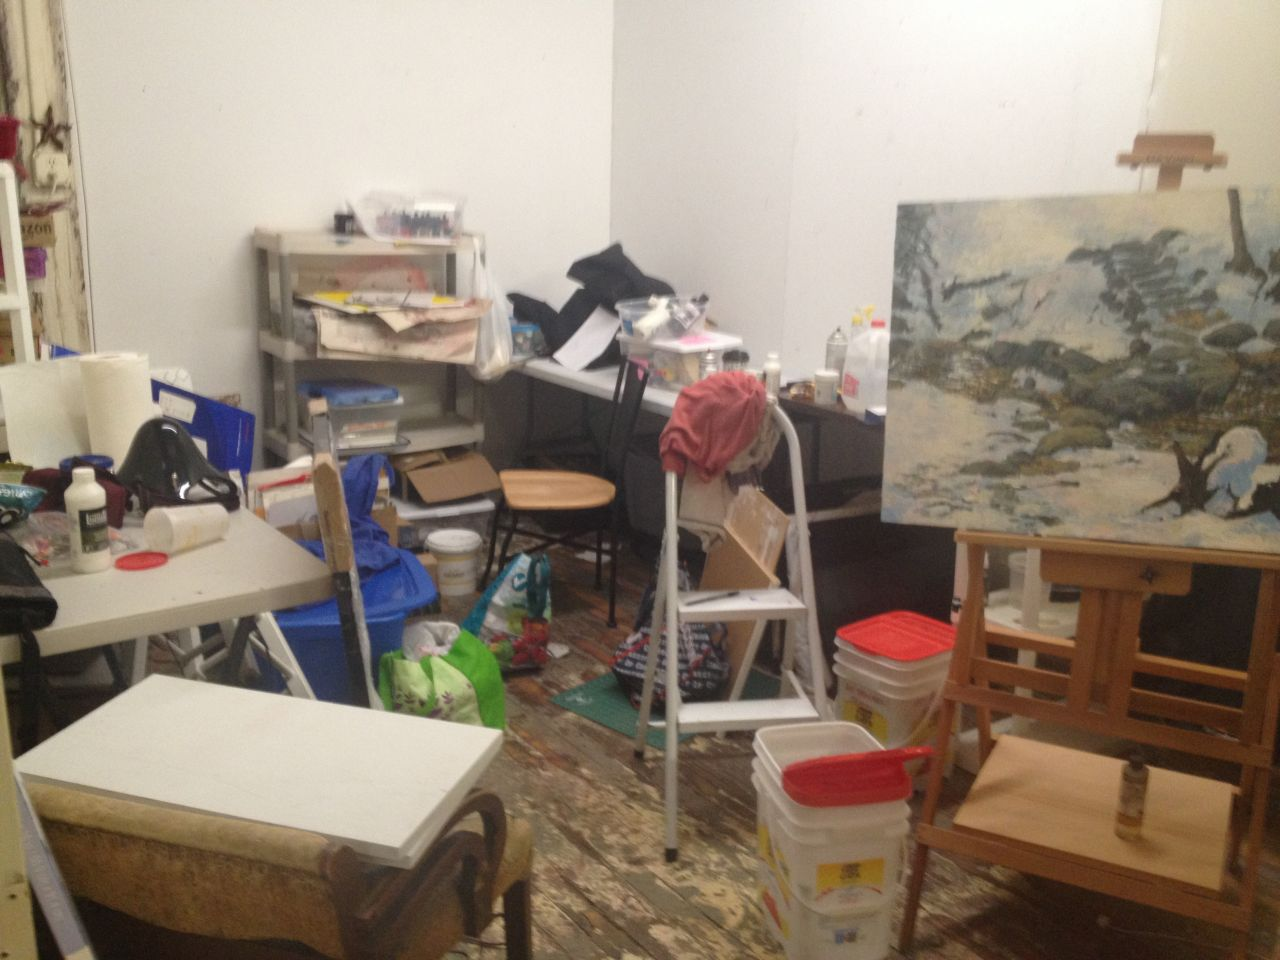 Studio facing the back wall.